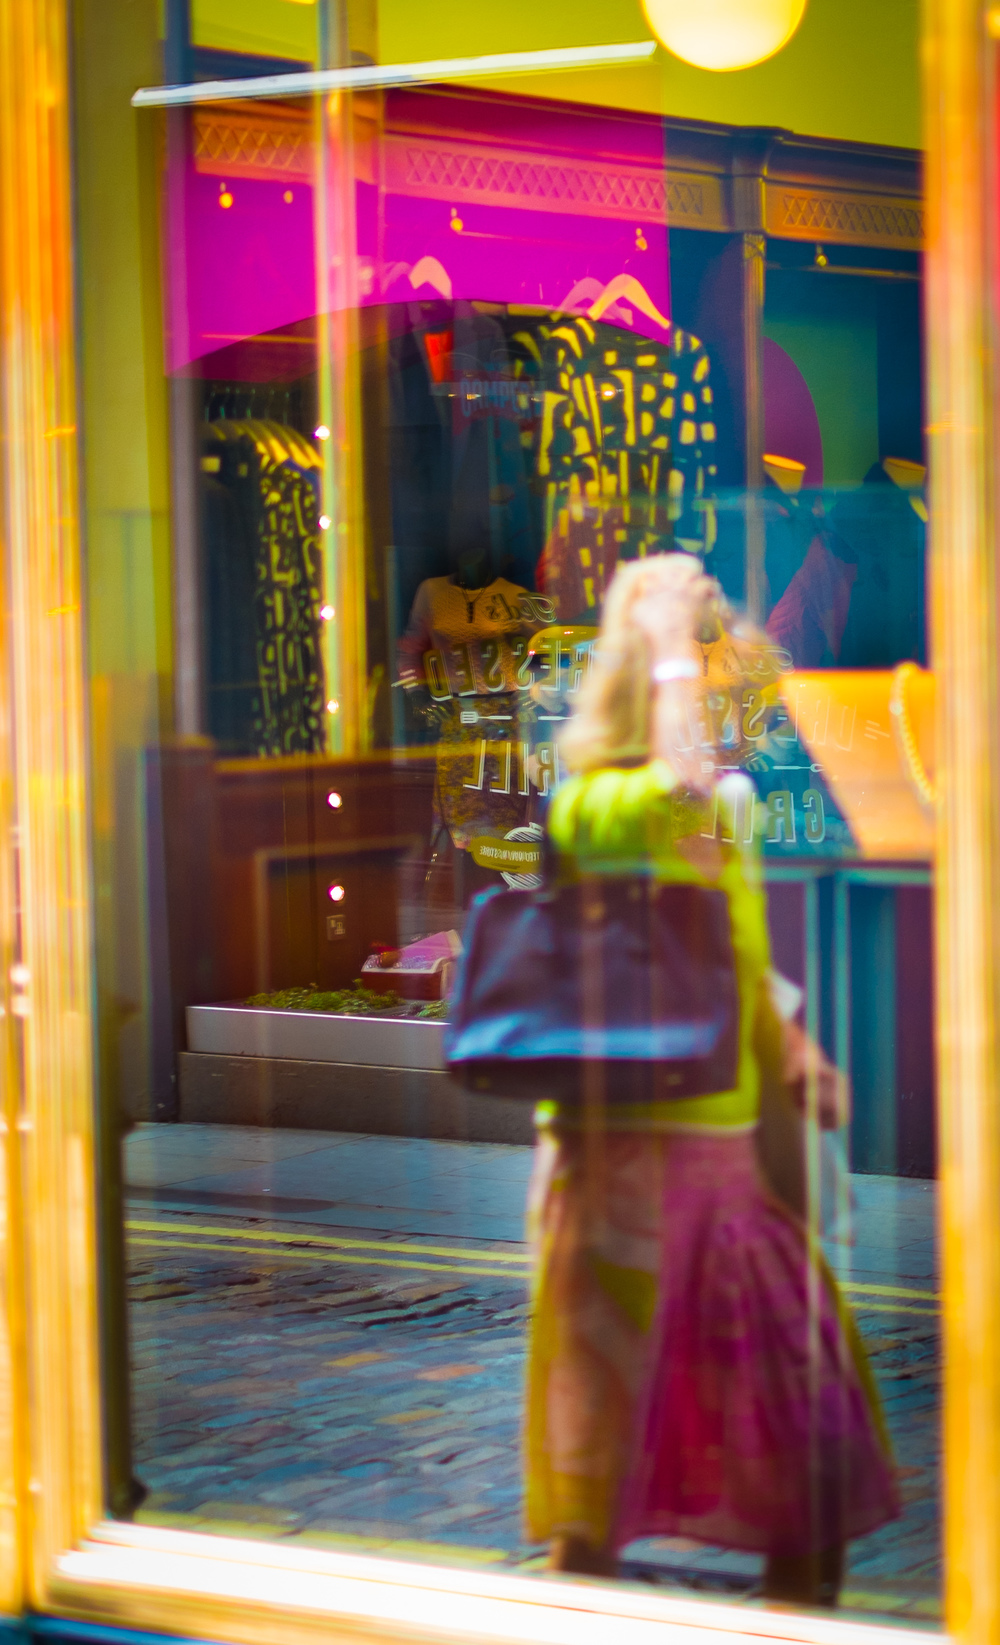 20140728 - Reflections (1500) -12.jpg